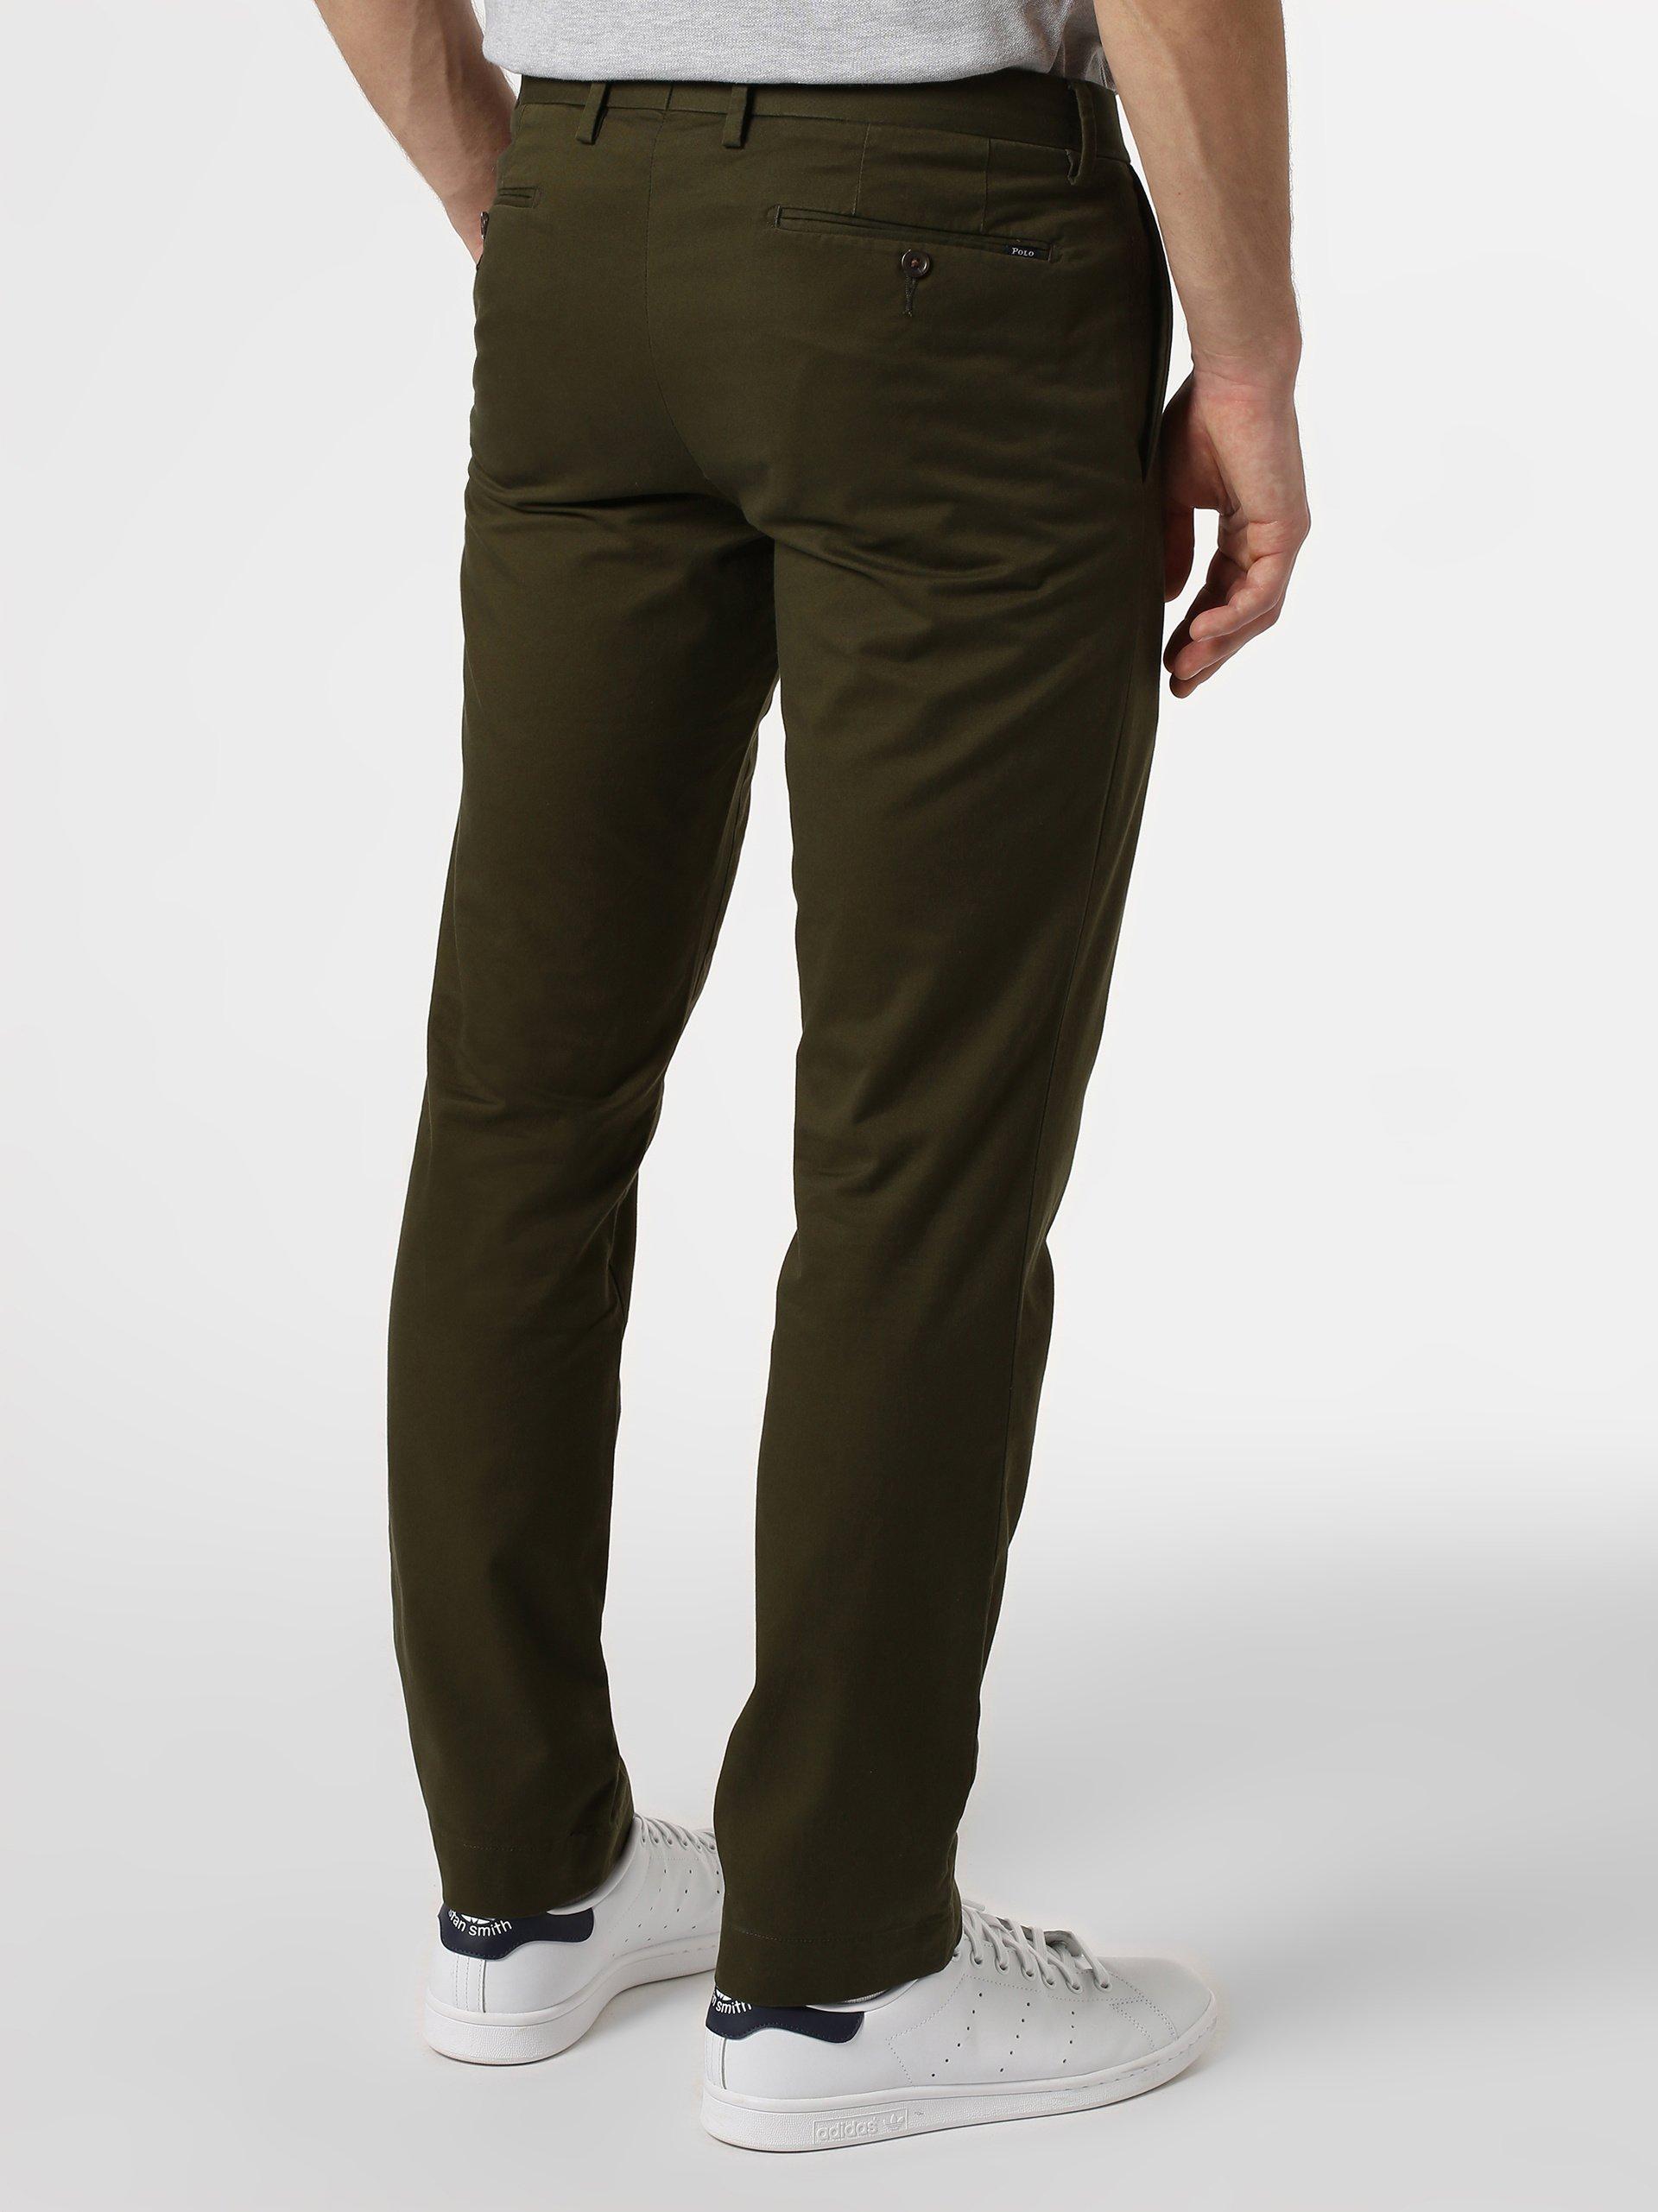 Polo Ralph Lauren Herren Chino - Slim Fit